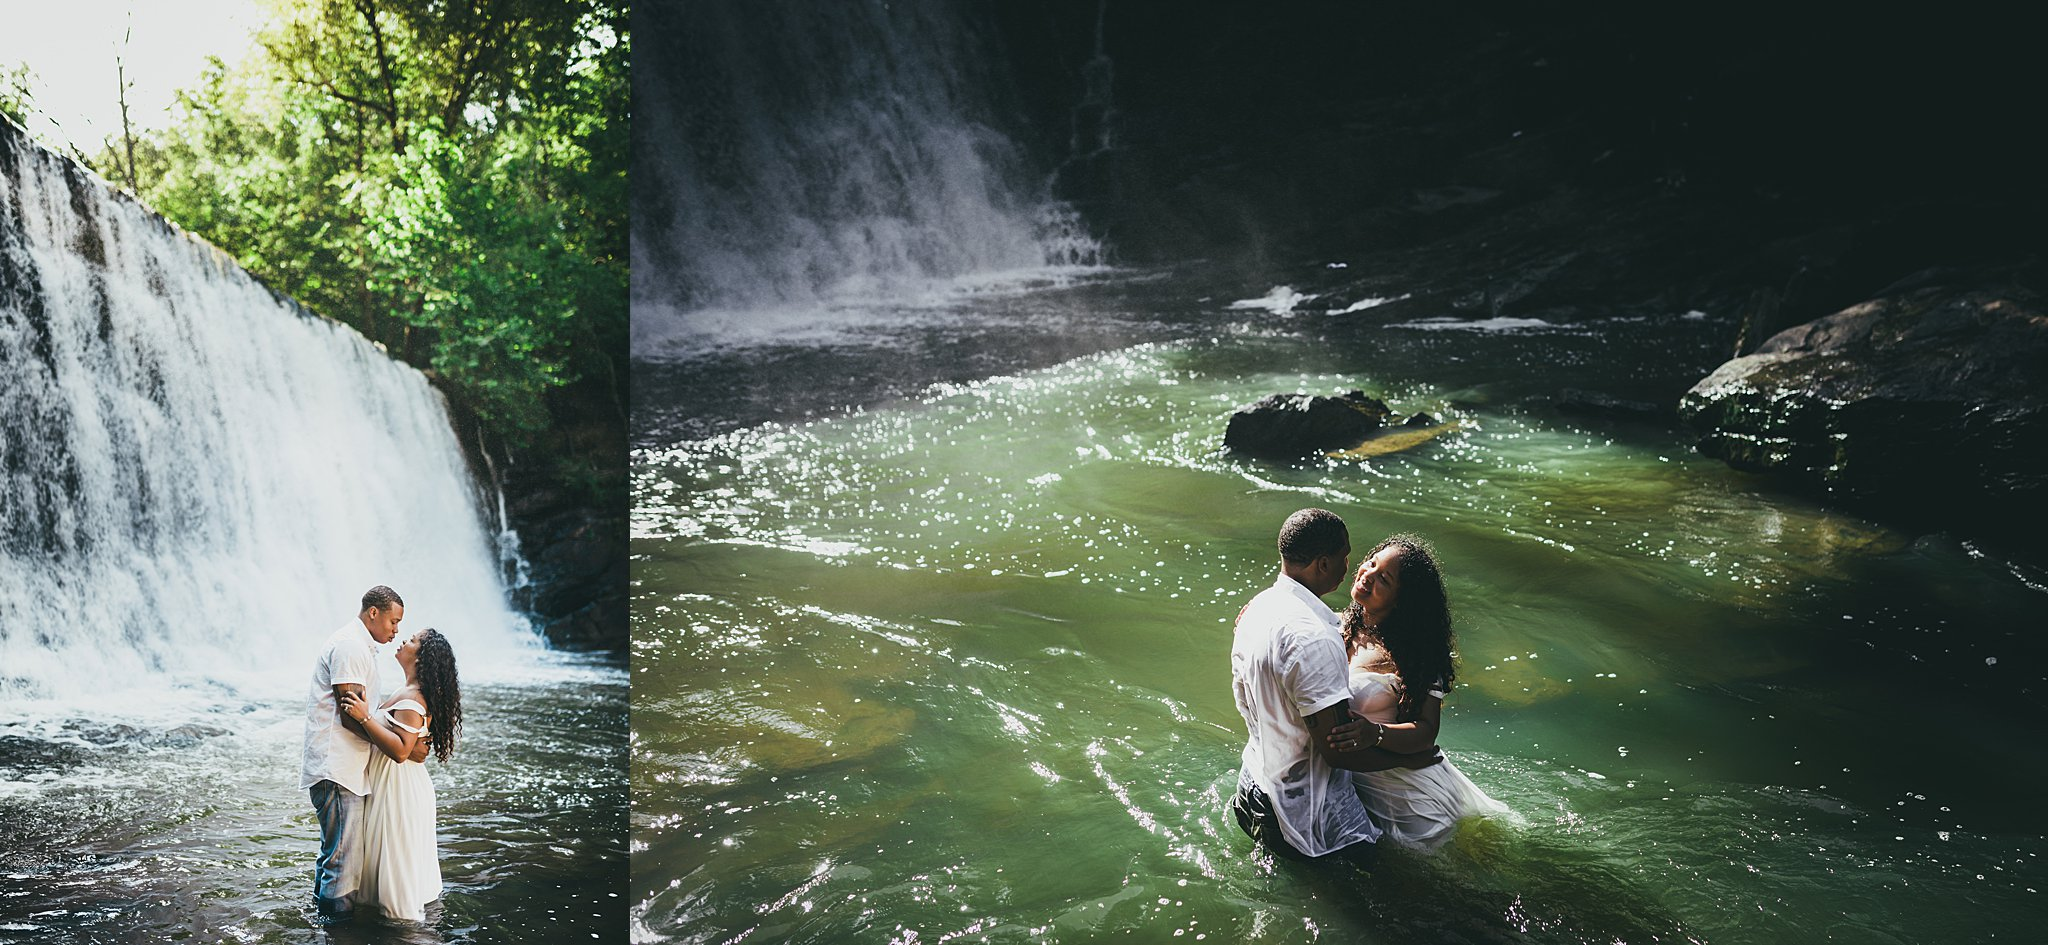 vickery-falls-at-roswell-mill-adventure-engagement-session-atlanta-wedding-photographers